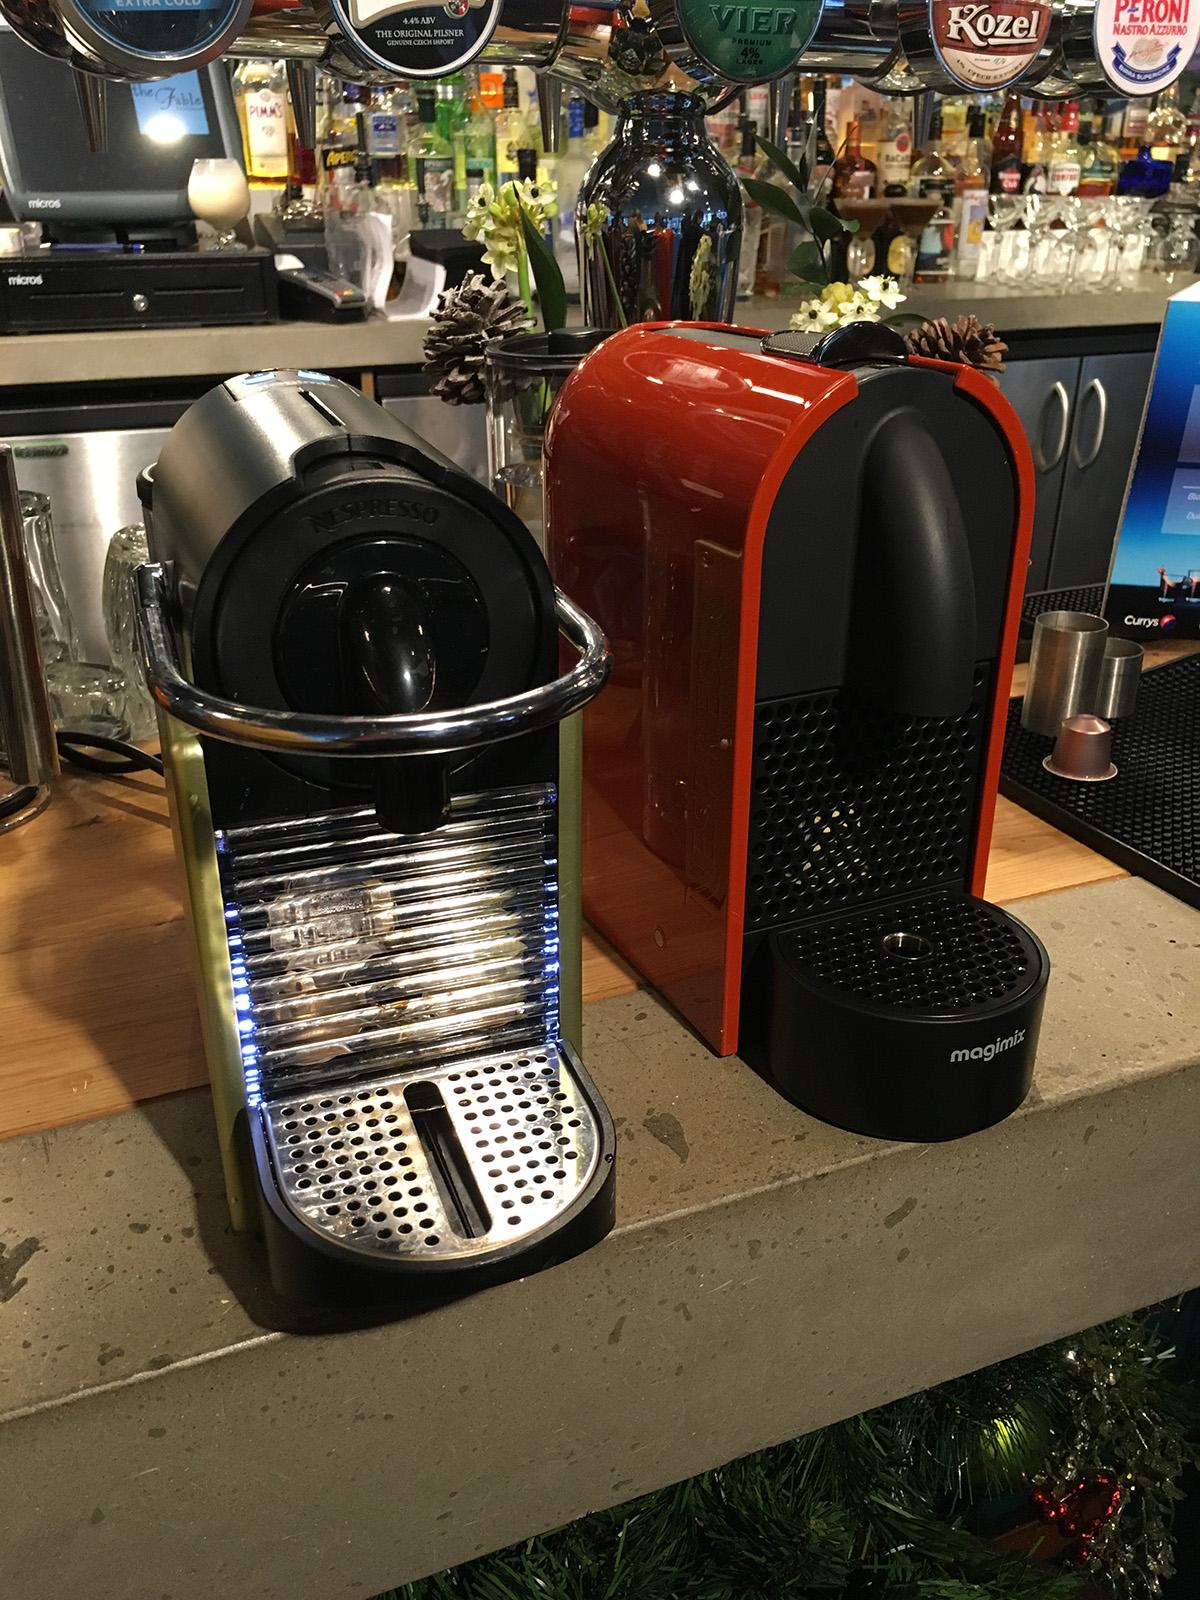 Coffee With Currys & Nespresso